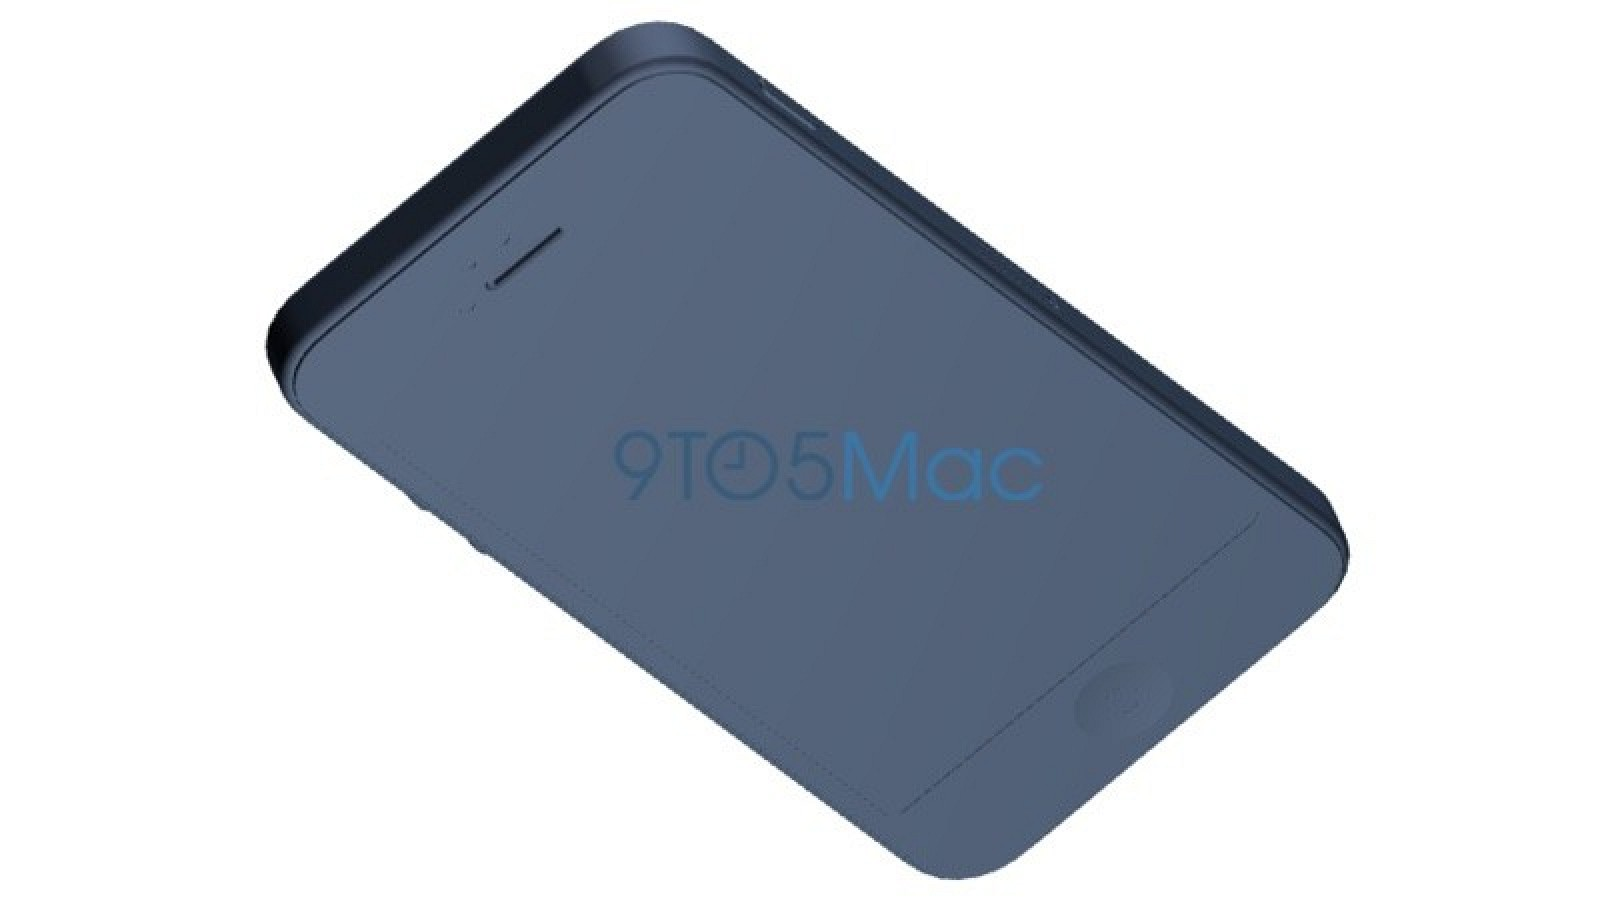 dizayn-iphone-5se-budet-identichen-iphone-5s-foto-----